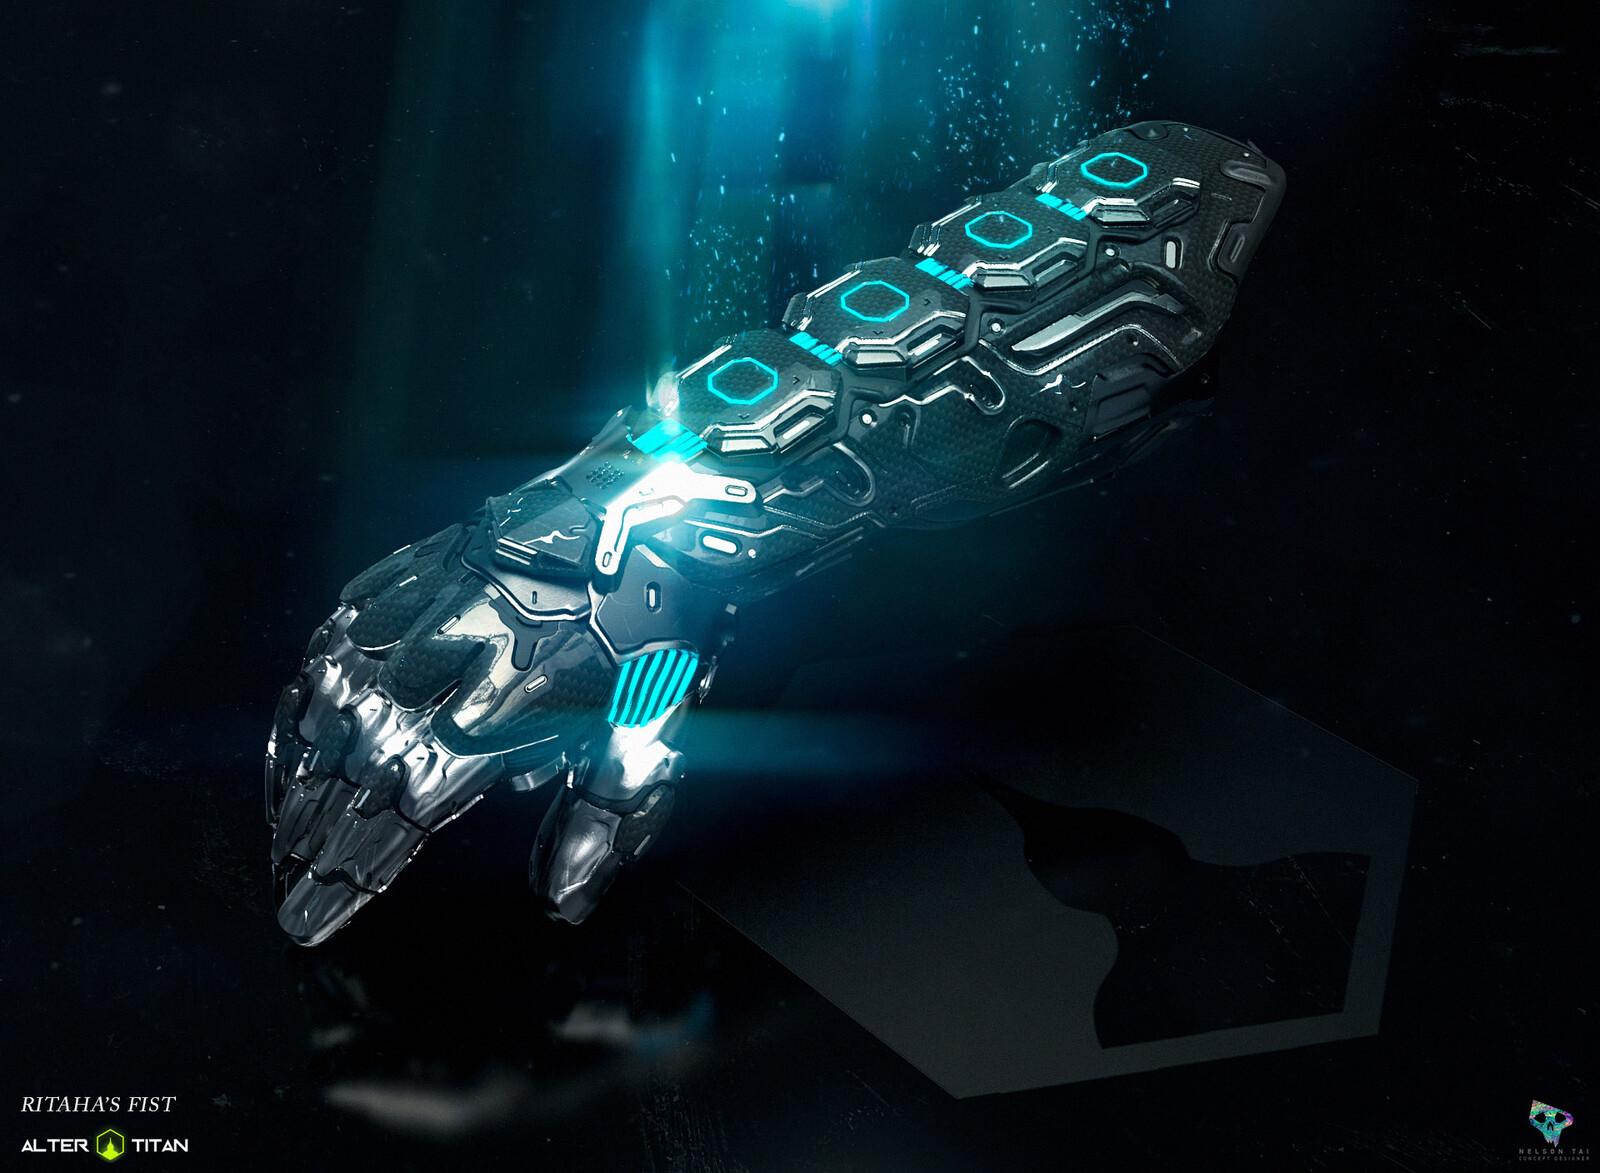 The secret weapon hidden under the depths.